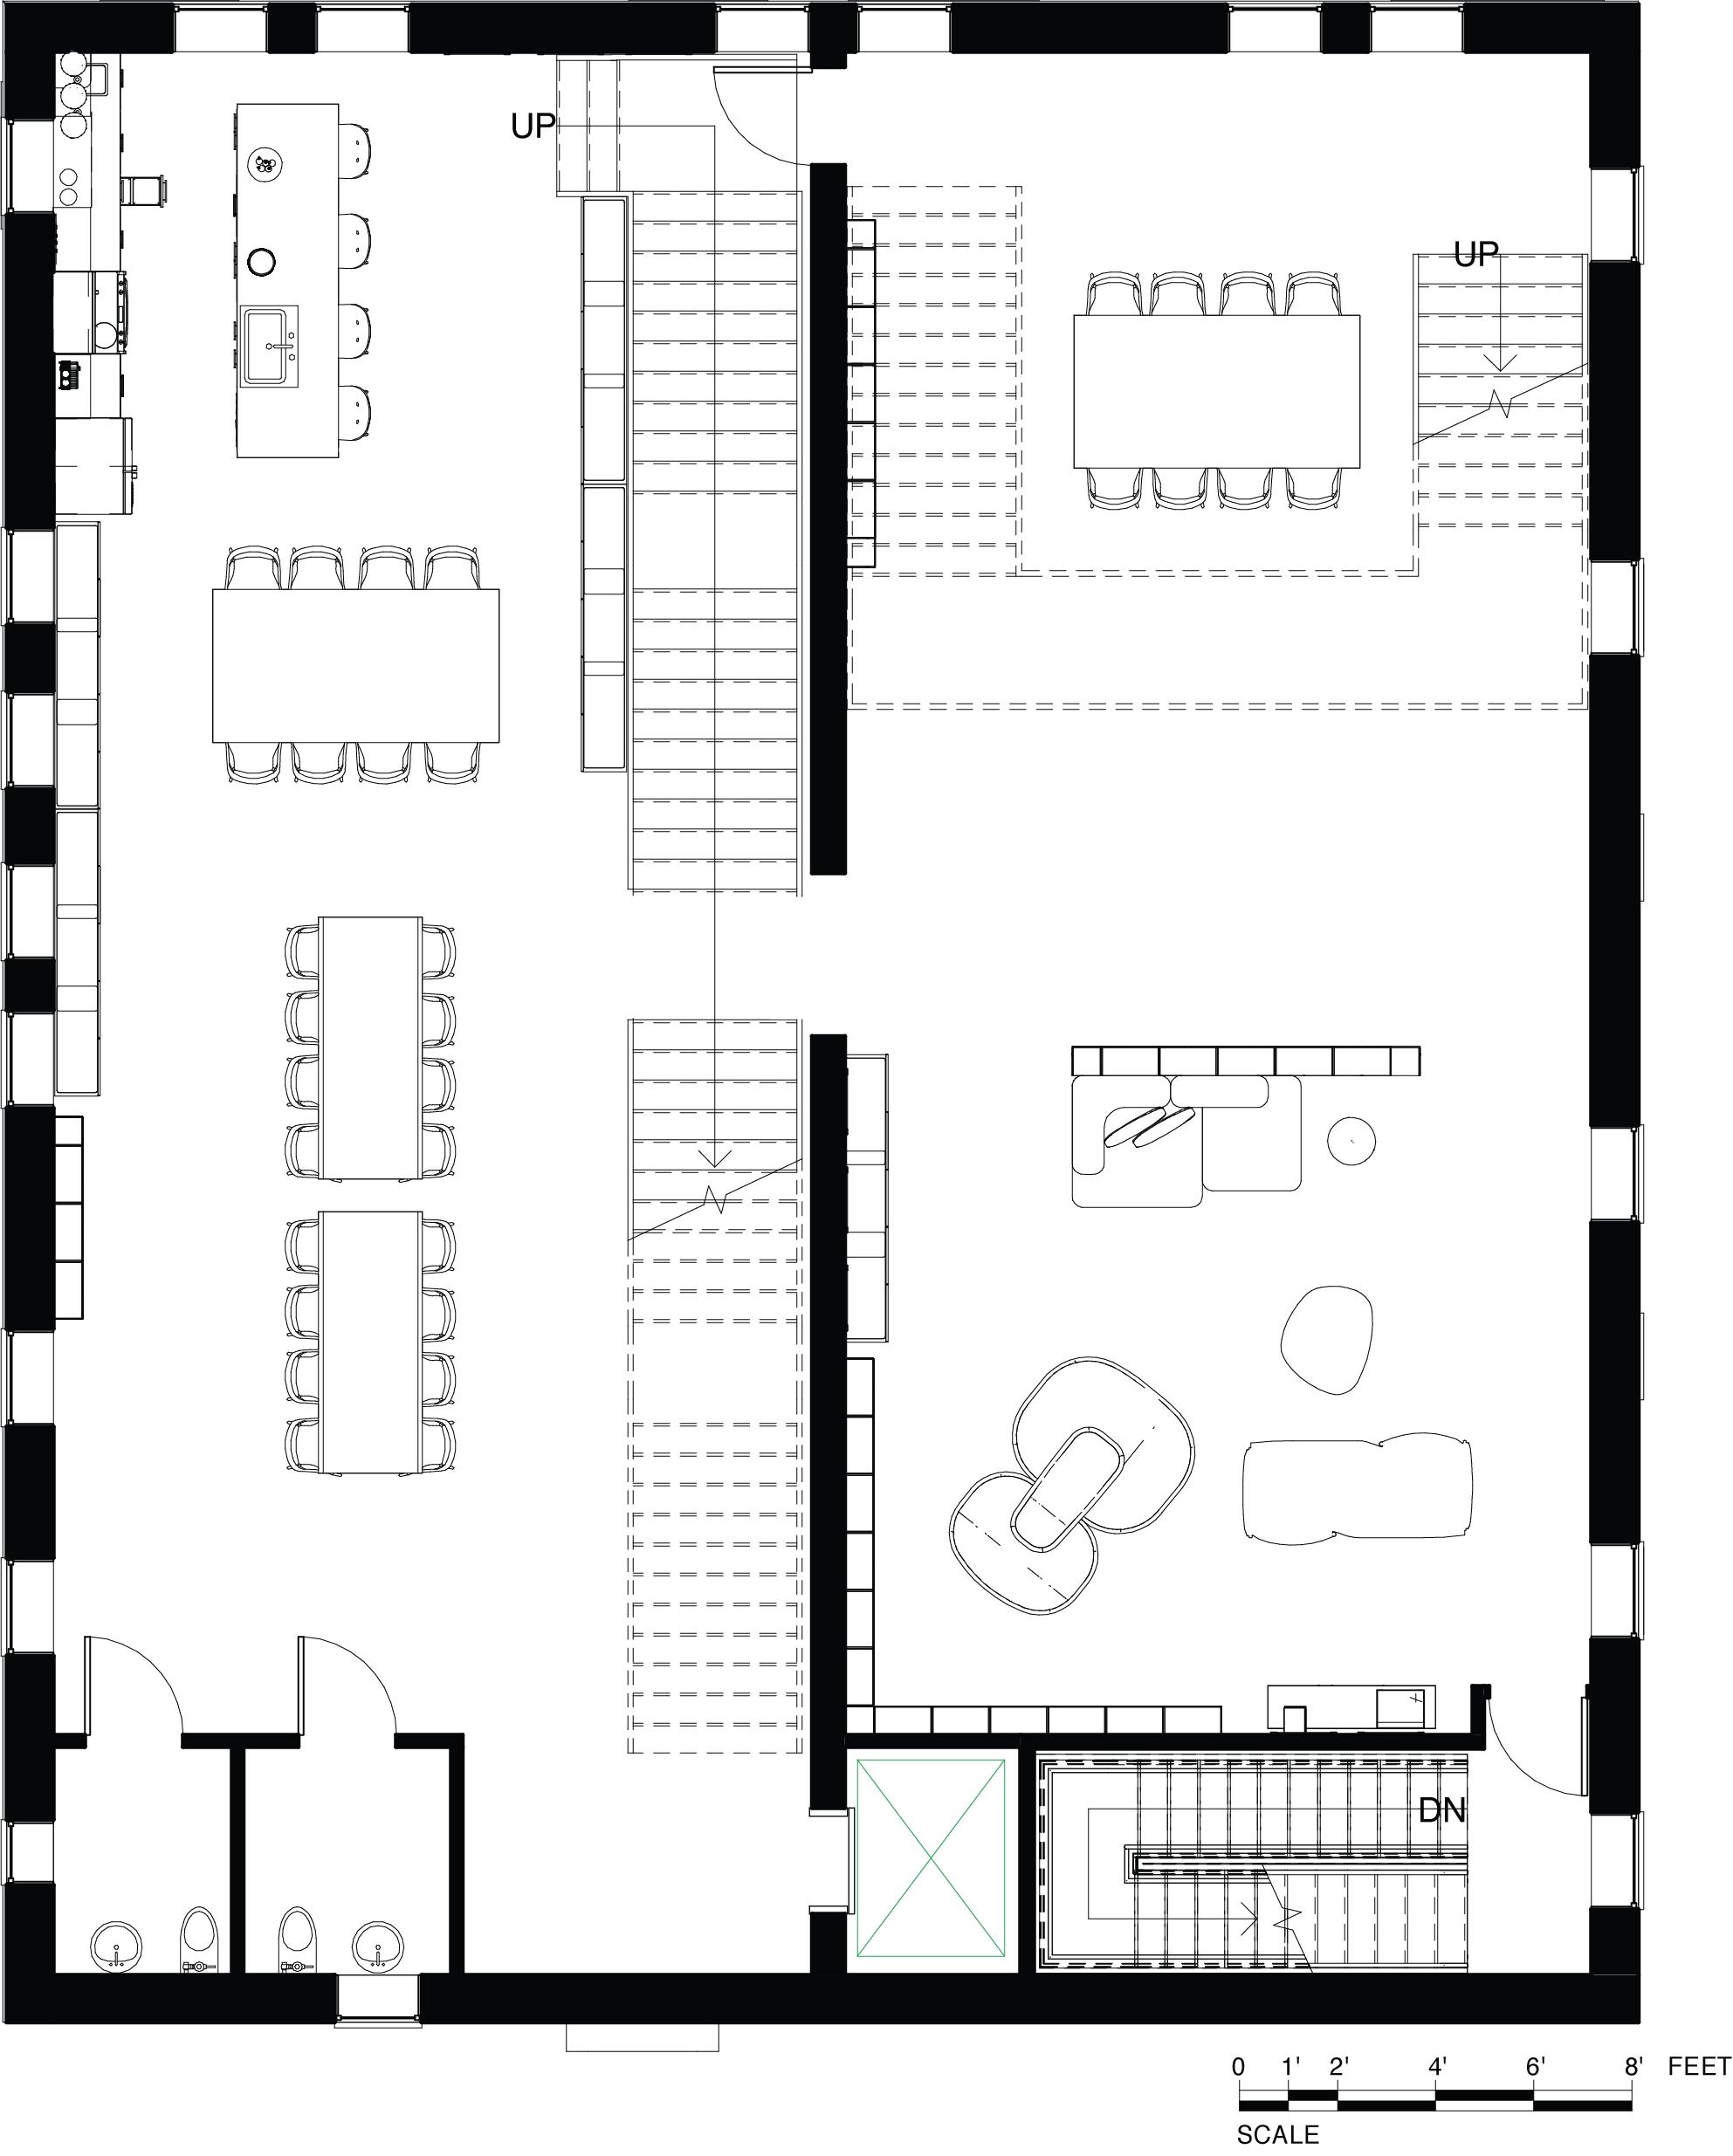 Level 02  Floor Plan - Community Gathering Space